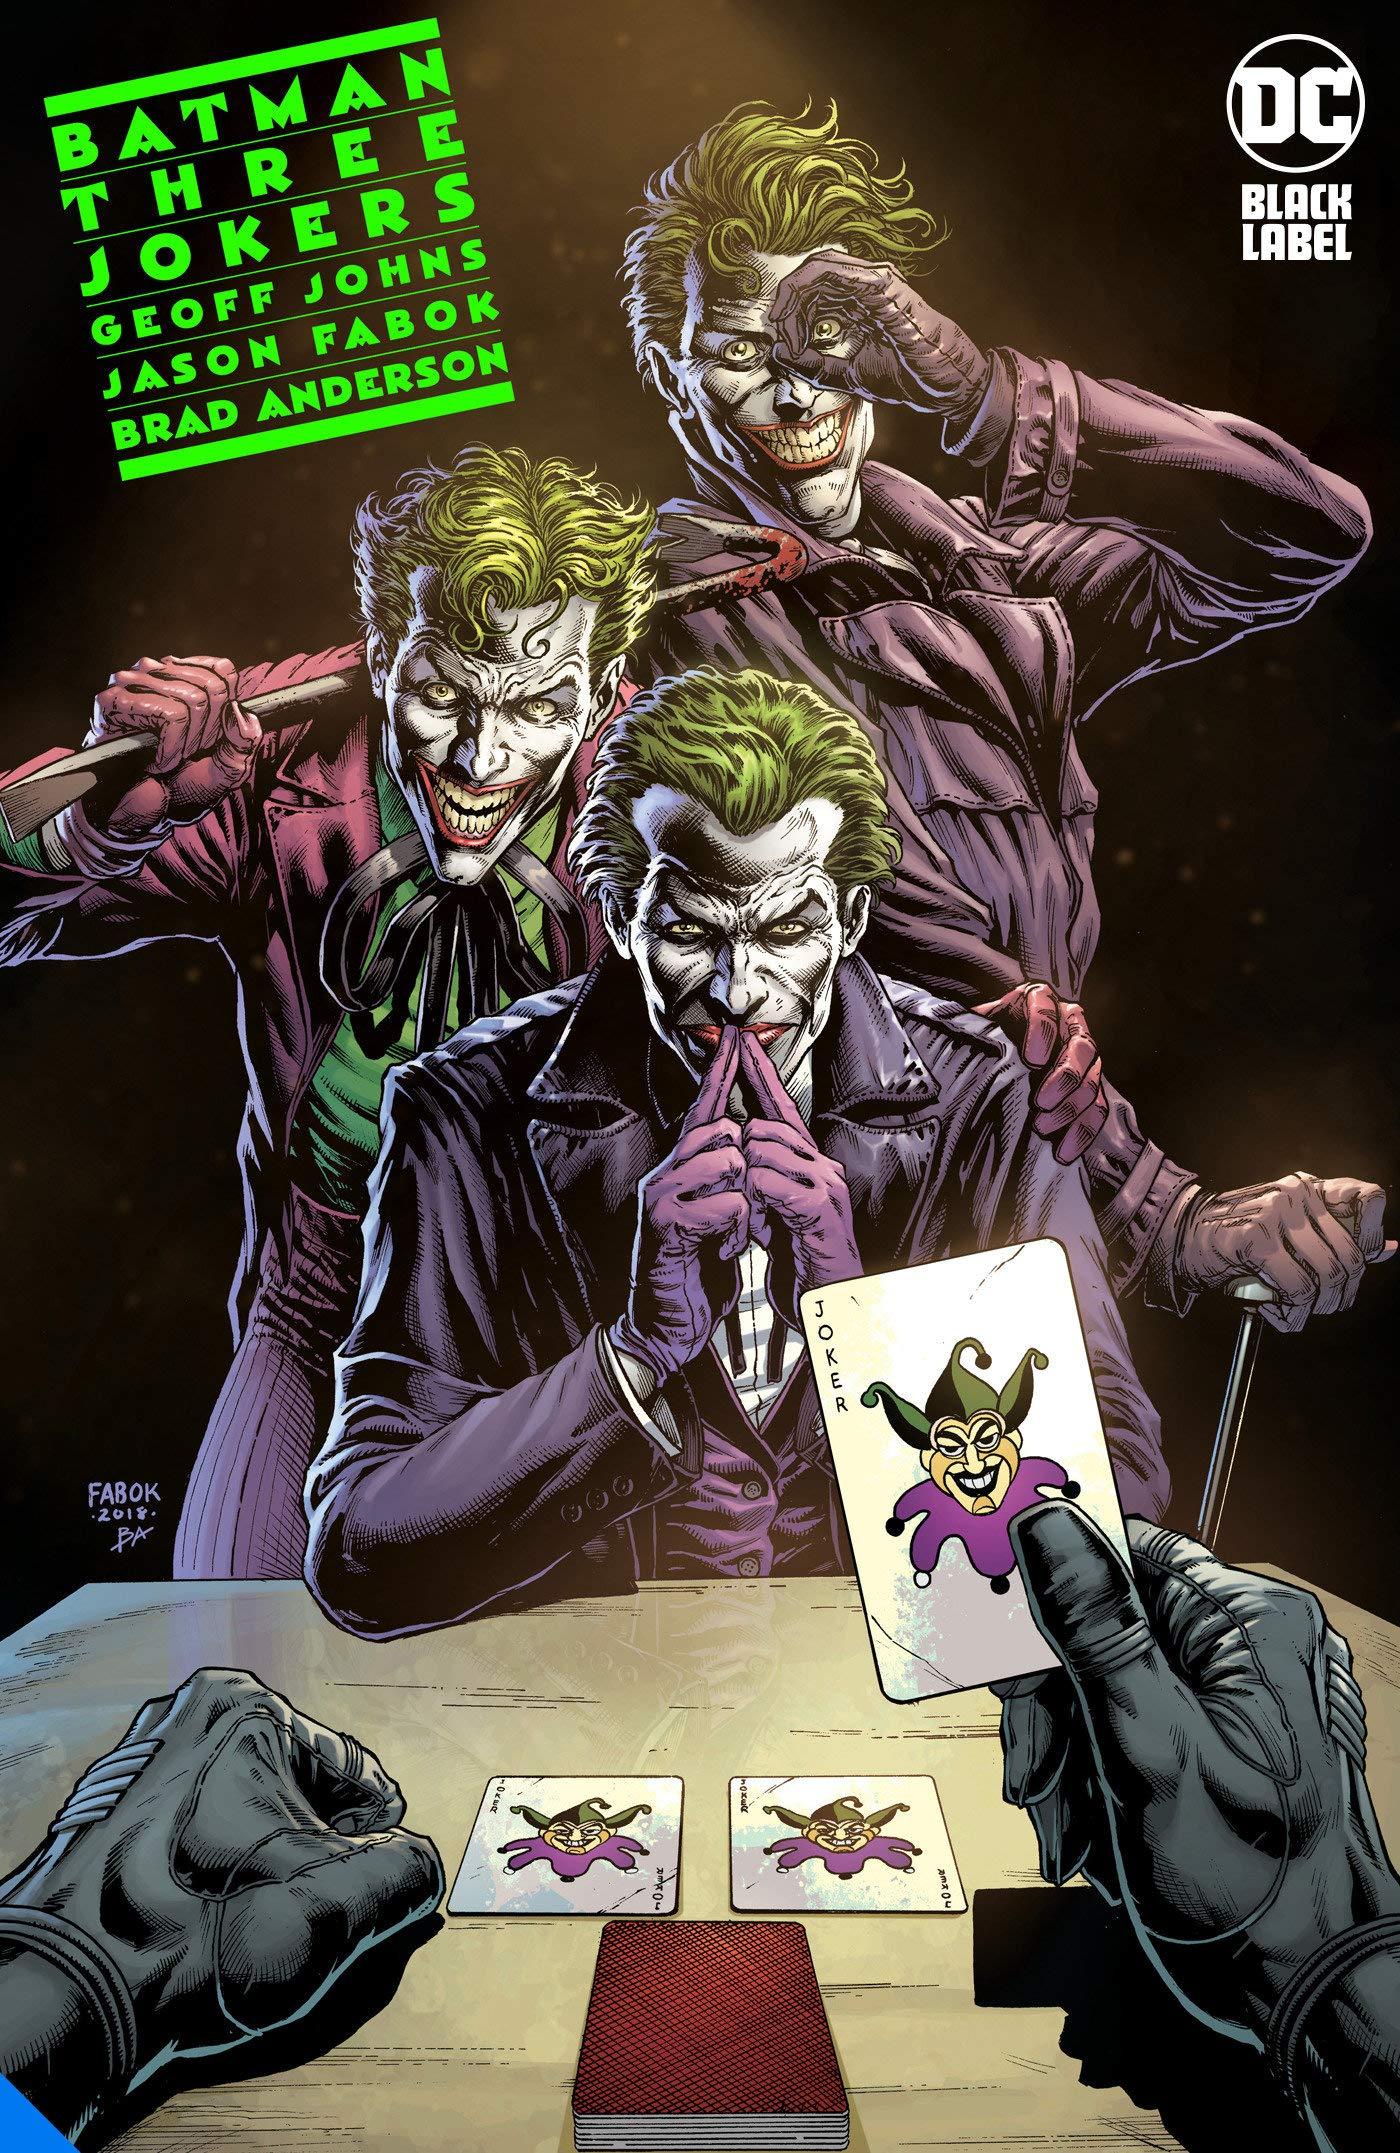 Batman: The Three Jokers by Jason Fabok, Geoff Johns